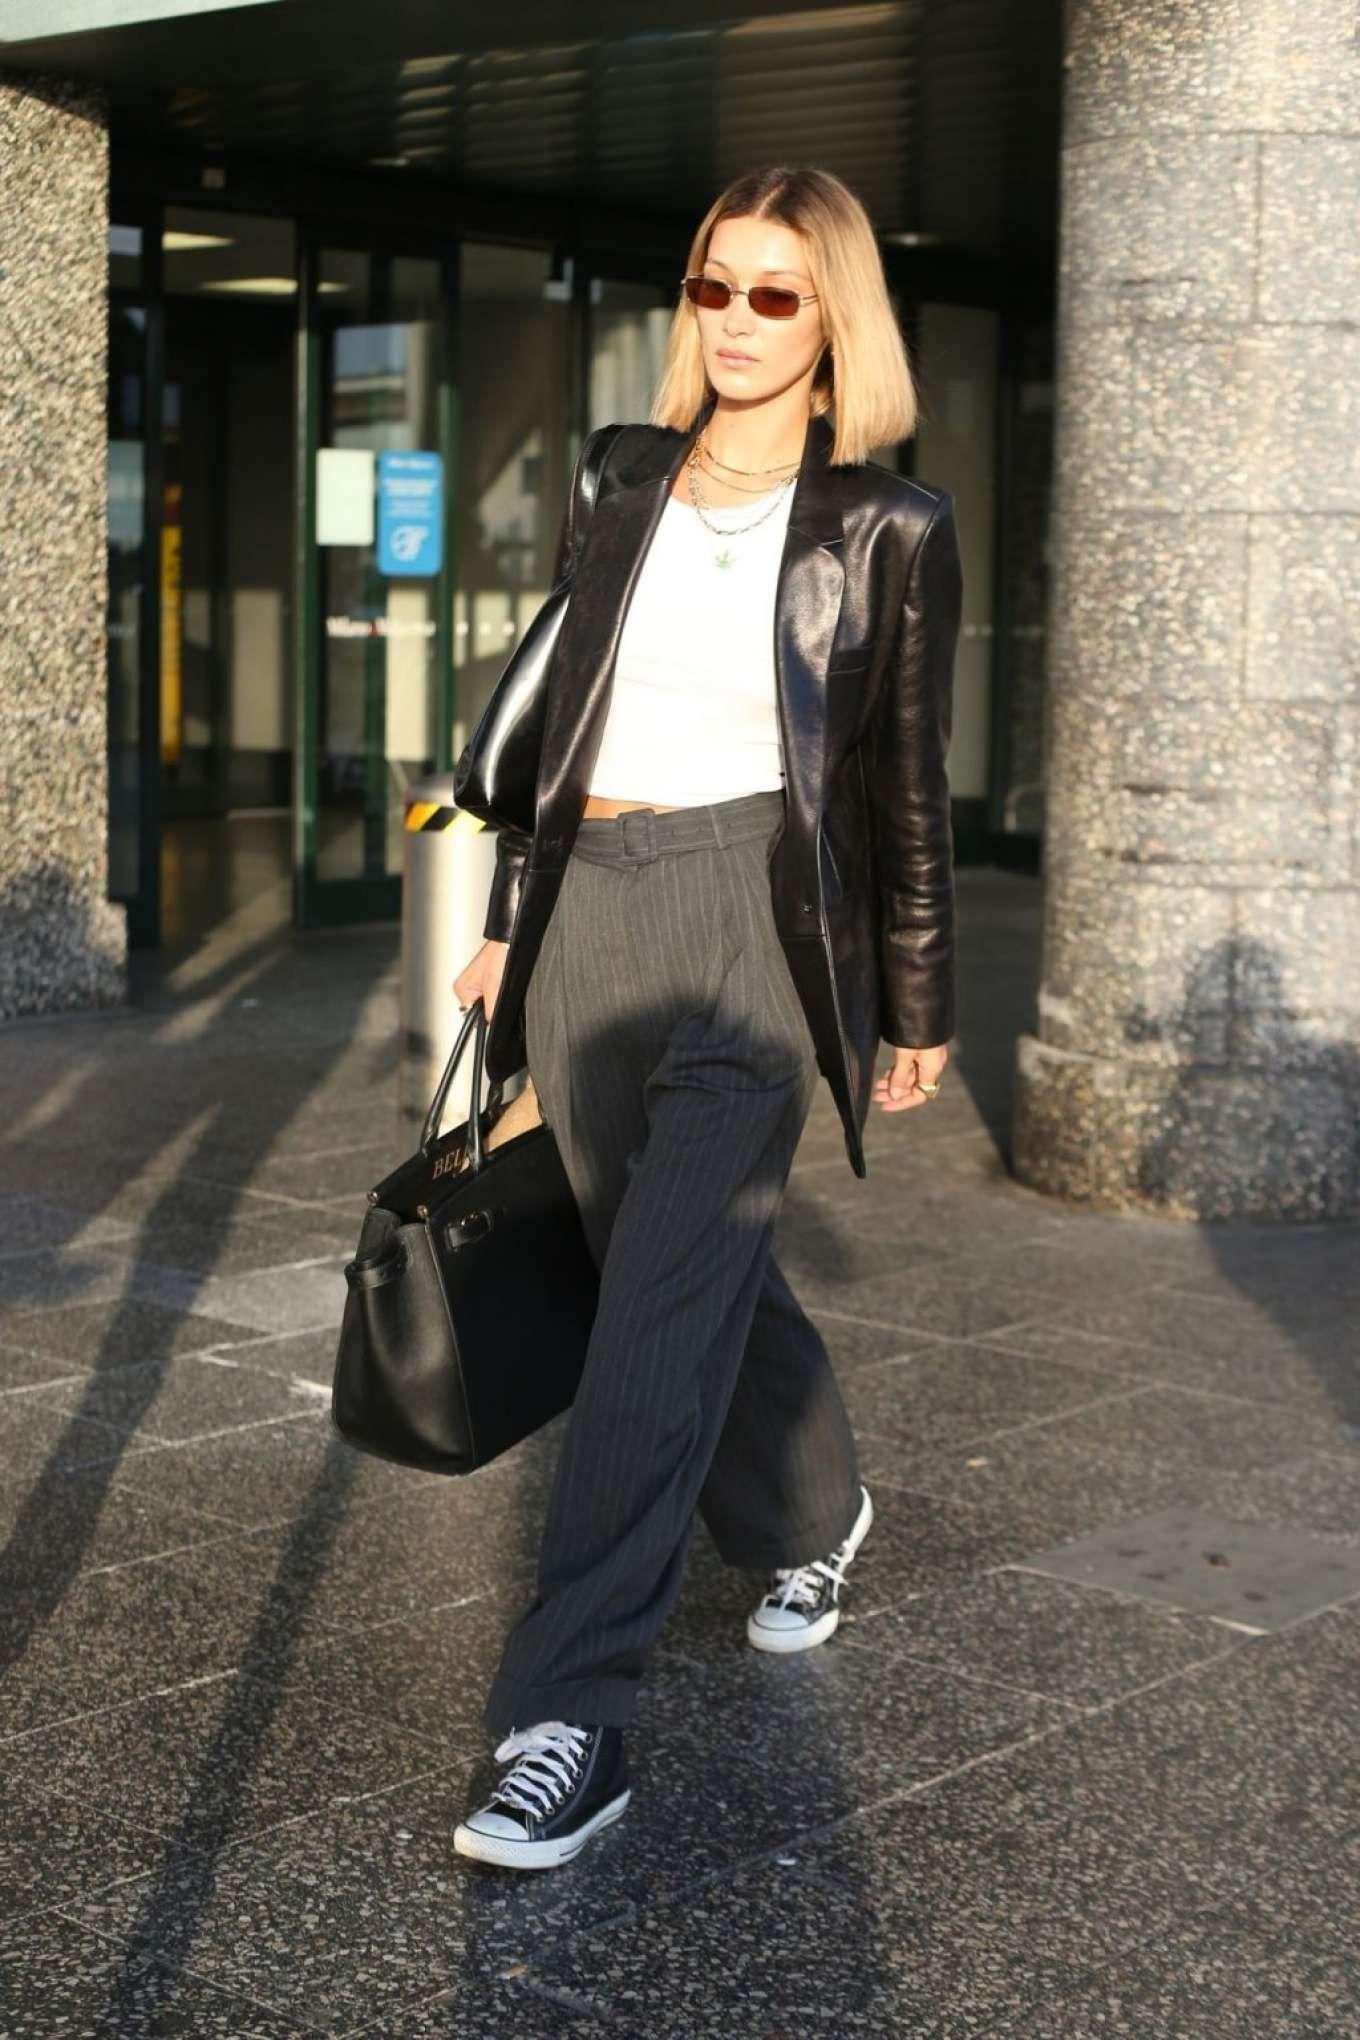 Photos Bella Hadid In Black Leather Blazer Arrives In Milan Bella Hadid Outfits Black Leather Blazer Hadid Style [ 2040 x 1360 Pixel ]